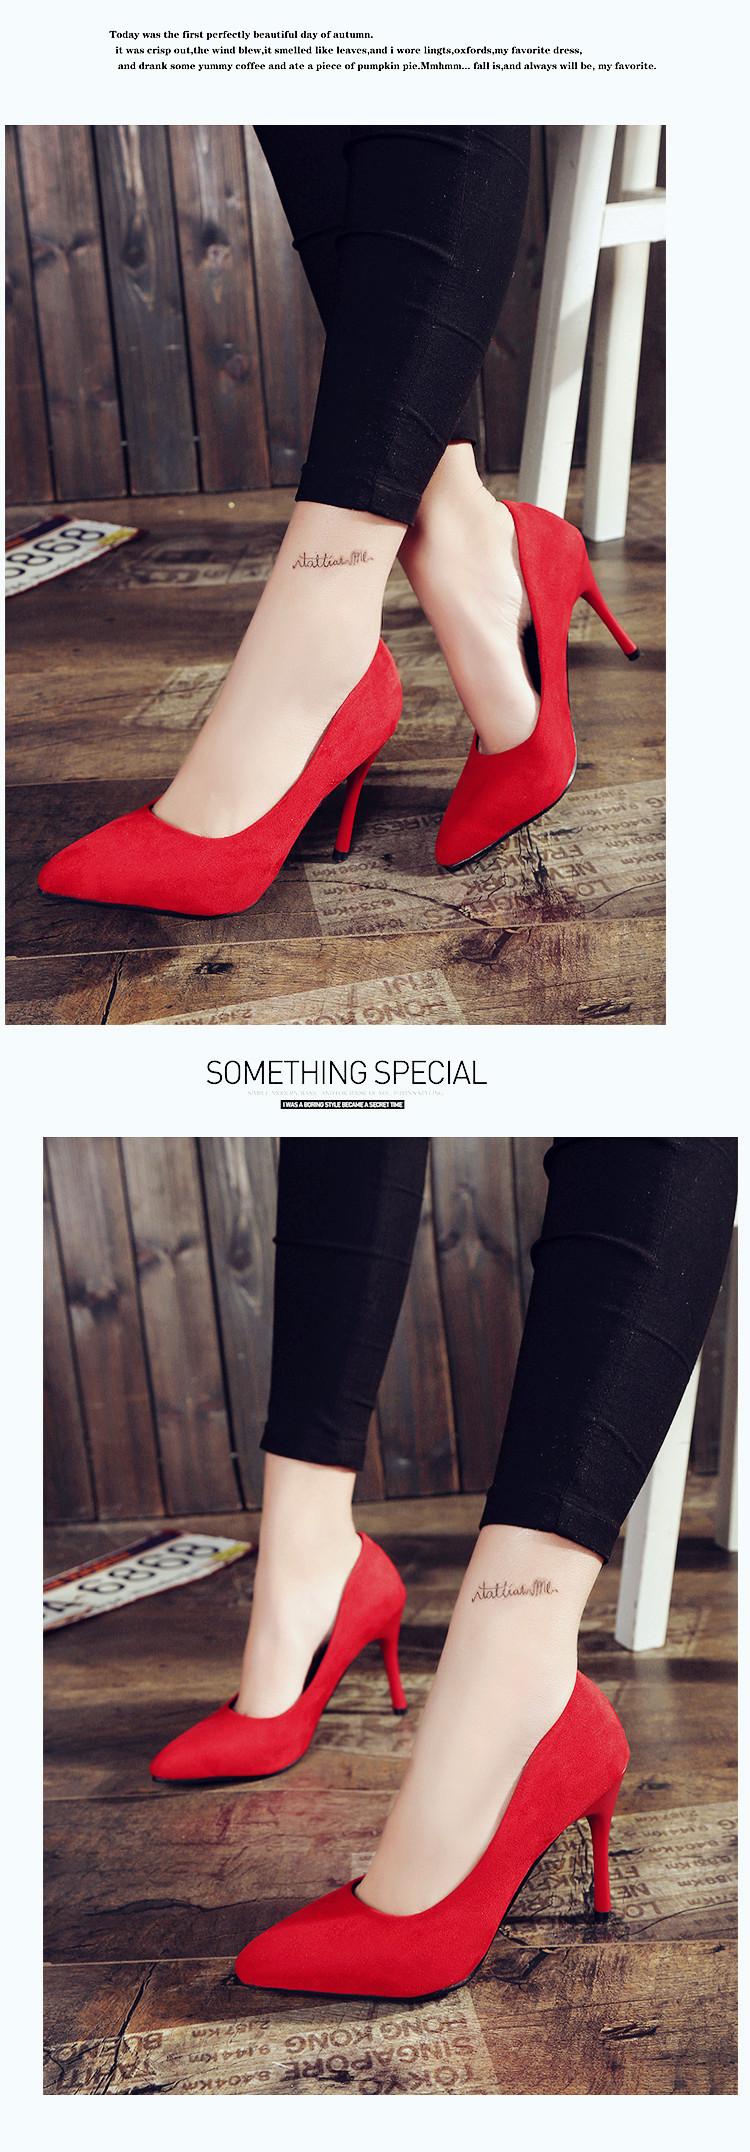 2018 HOT Summer Femmes Chaussures Bout Pointu 15